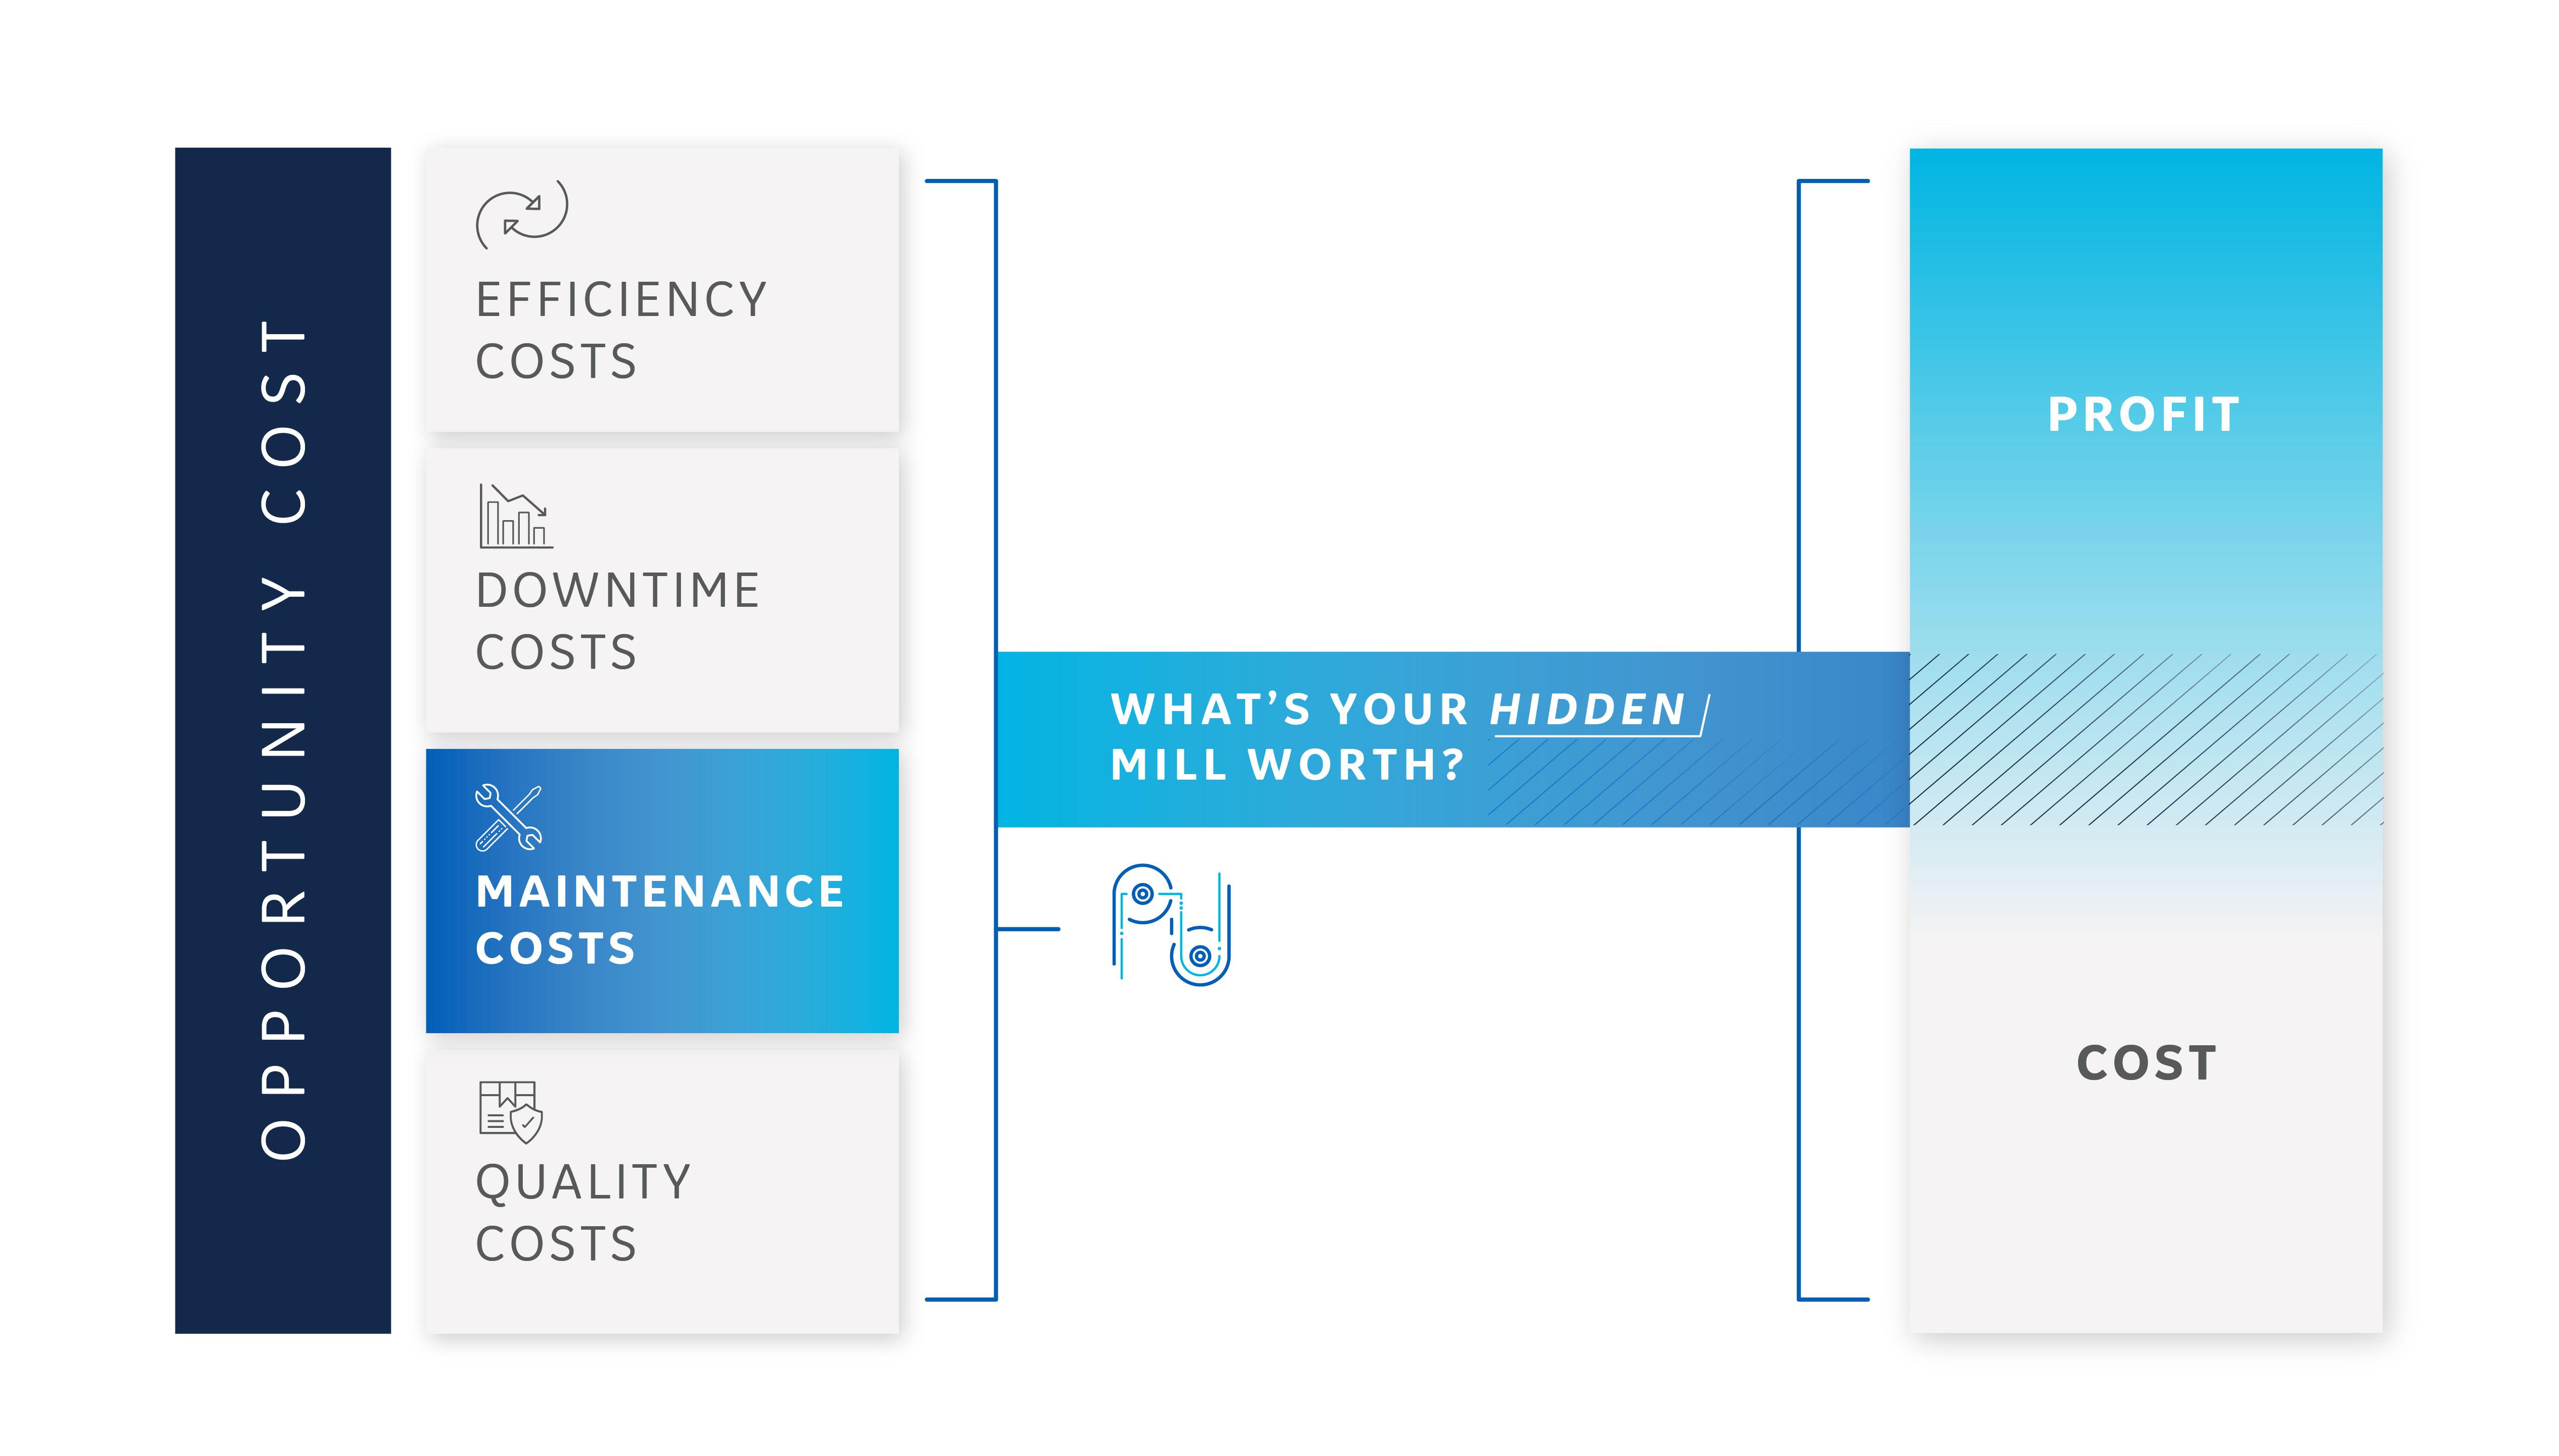 Efficiency costs in the Steel Industry graphic | GE Digital